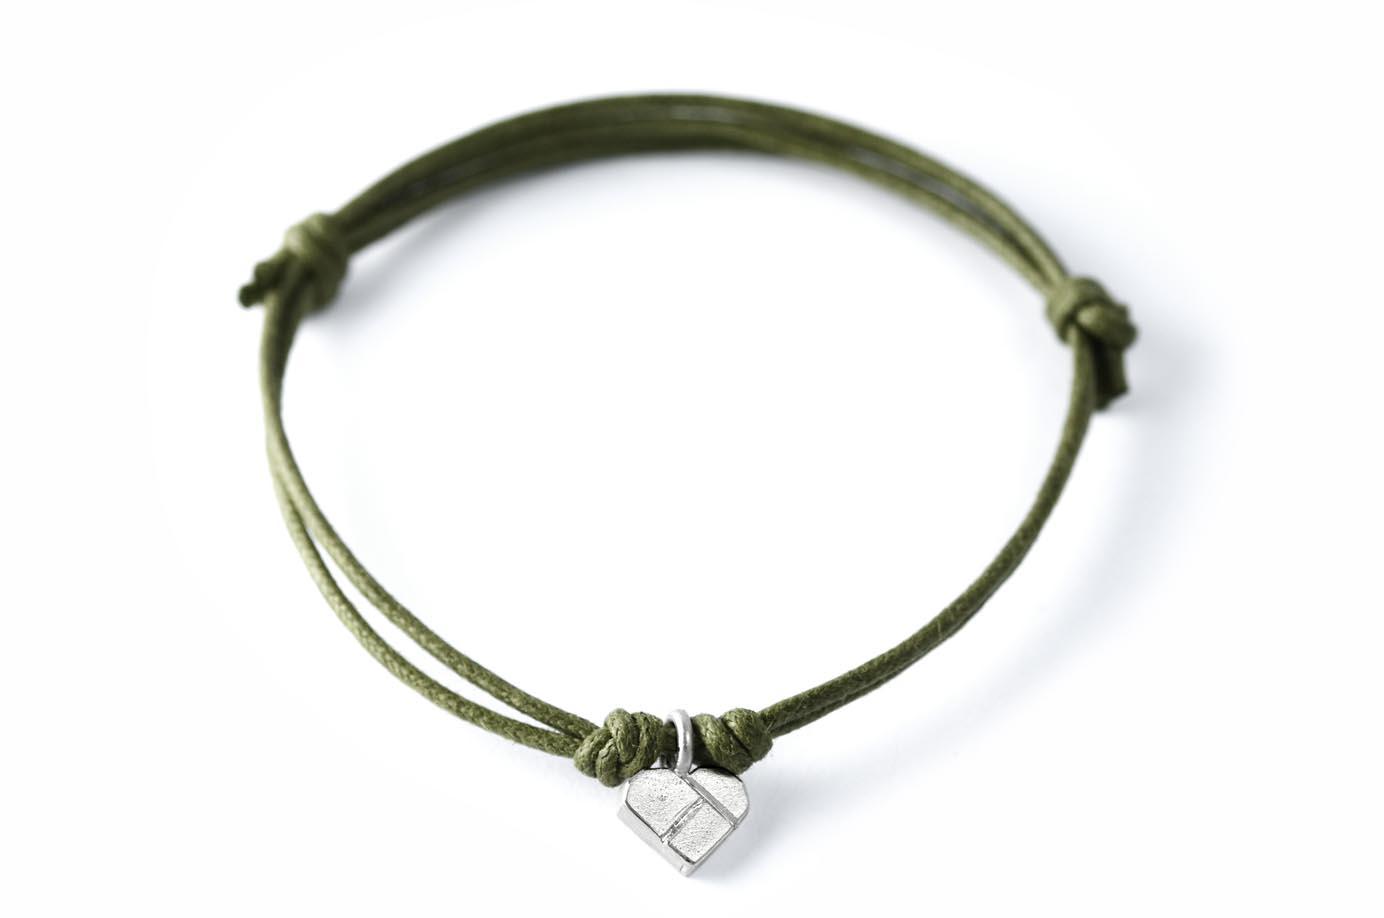 HERZCHEN - Tangram Kette oder Armband 935 Silber auf Wunsch vergoldet